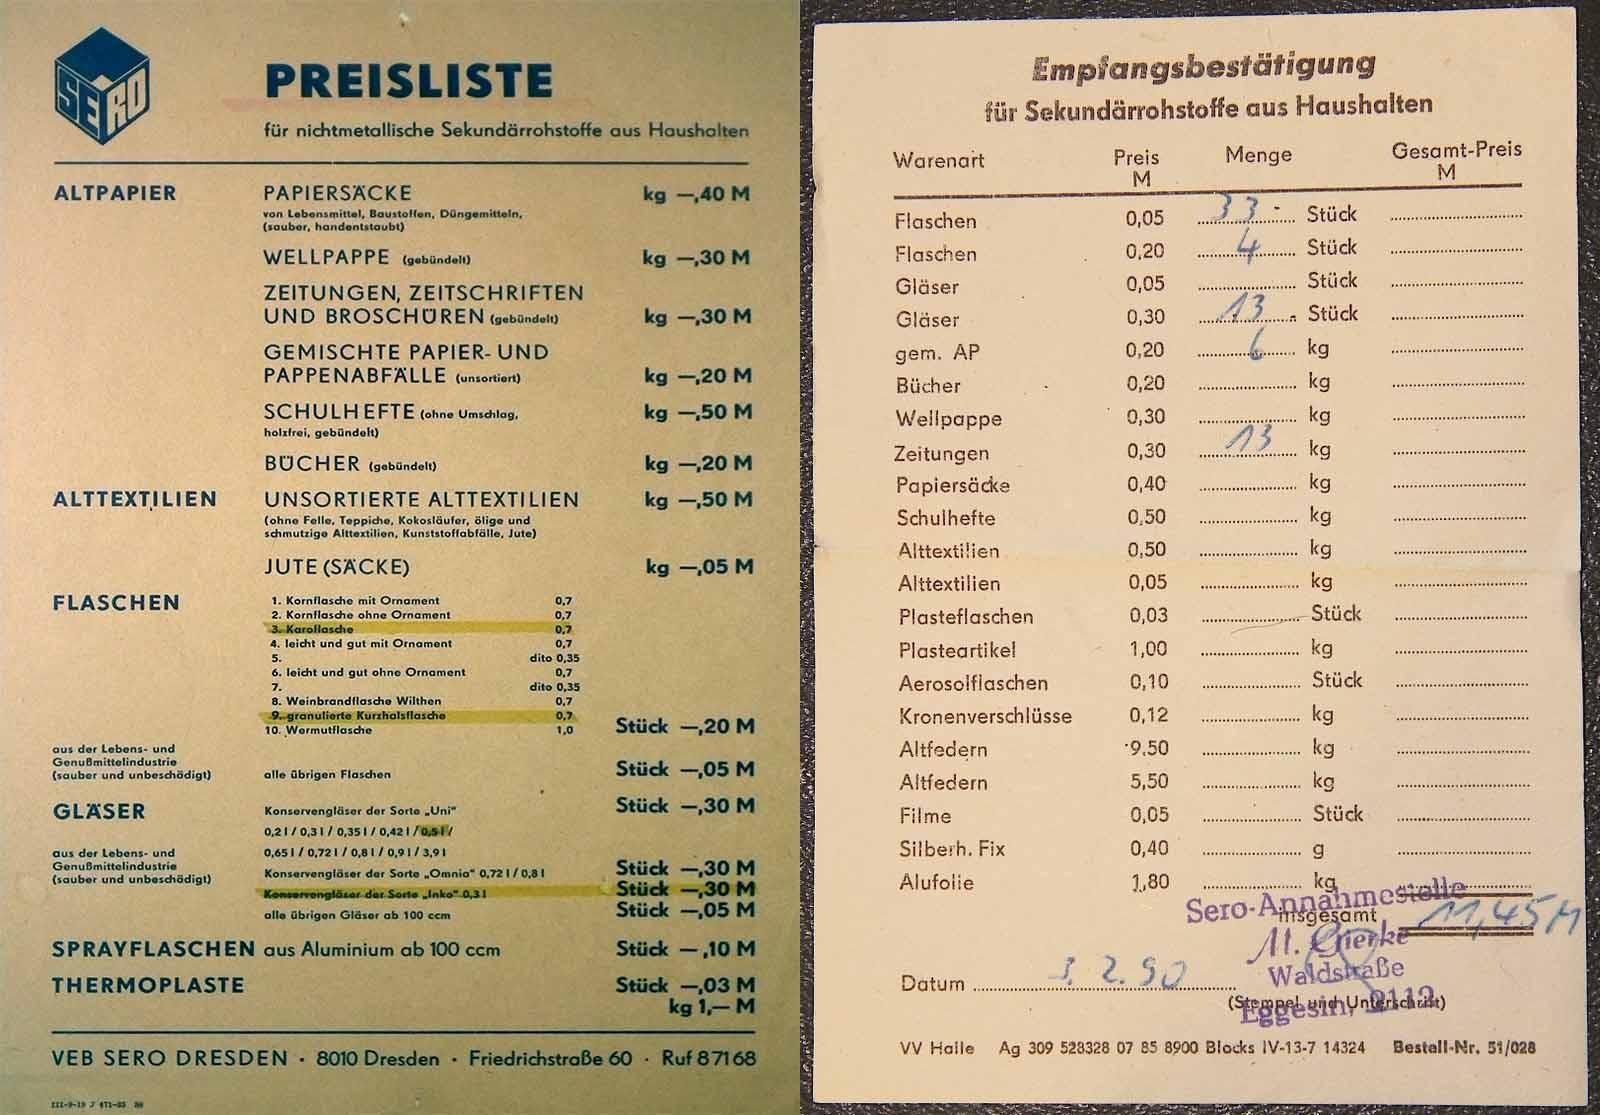 Altstoffpreisliste der DDR, Foto Wikipedia